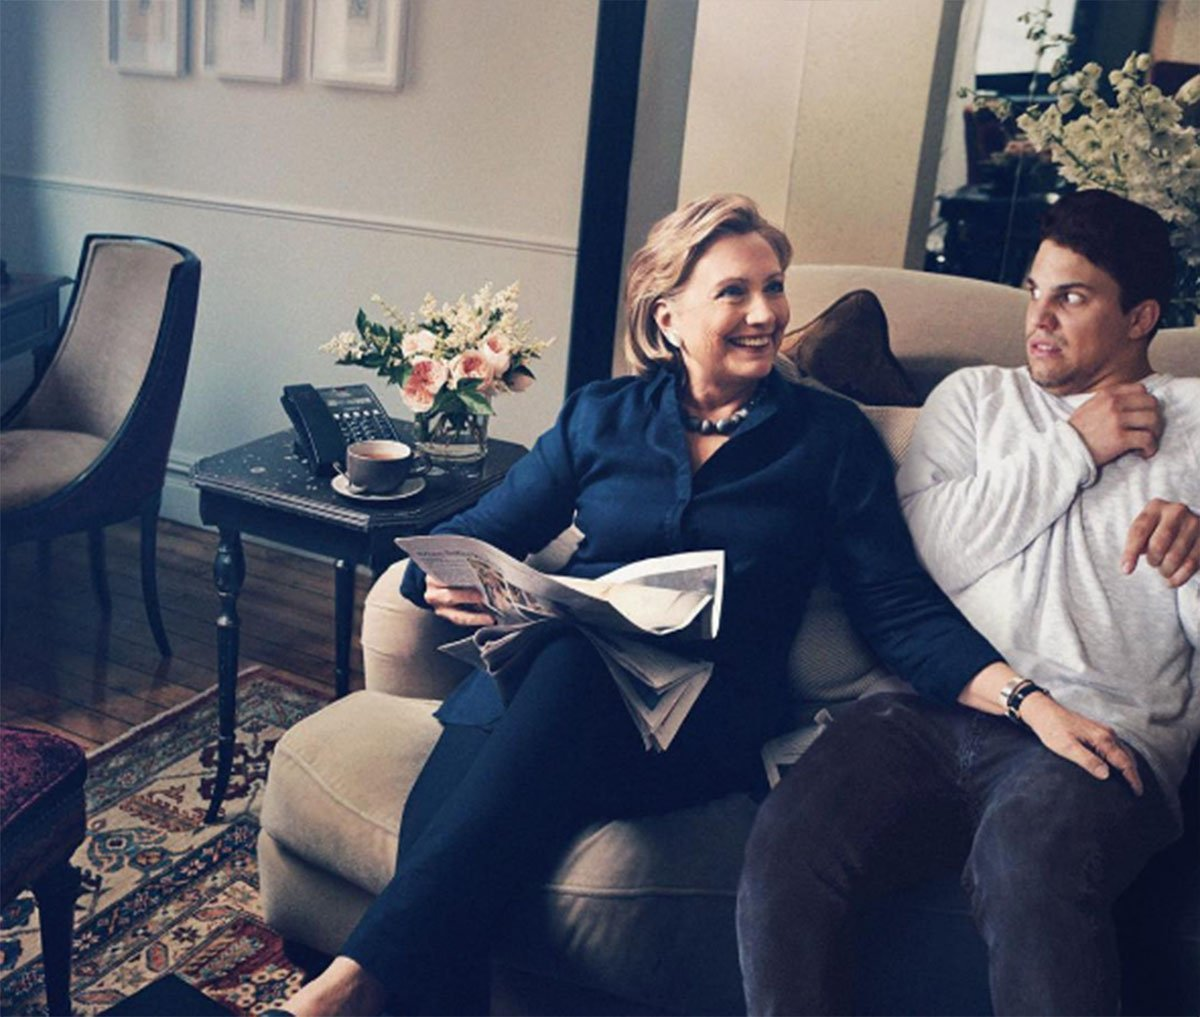 Guy Photoshops Himself 15.jpg Guy Photoshops Himself Into Relatable Scenarios With Celebrities https://www.instagram.com/averagerob/